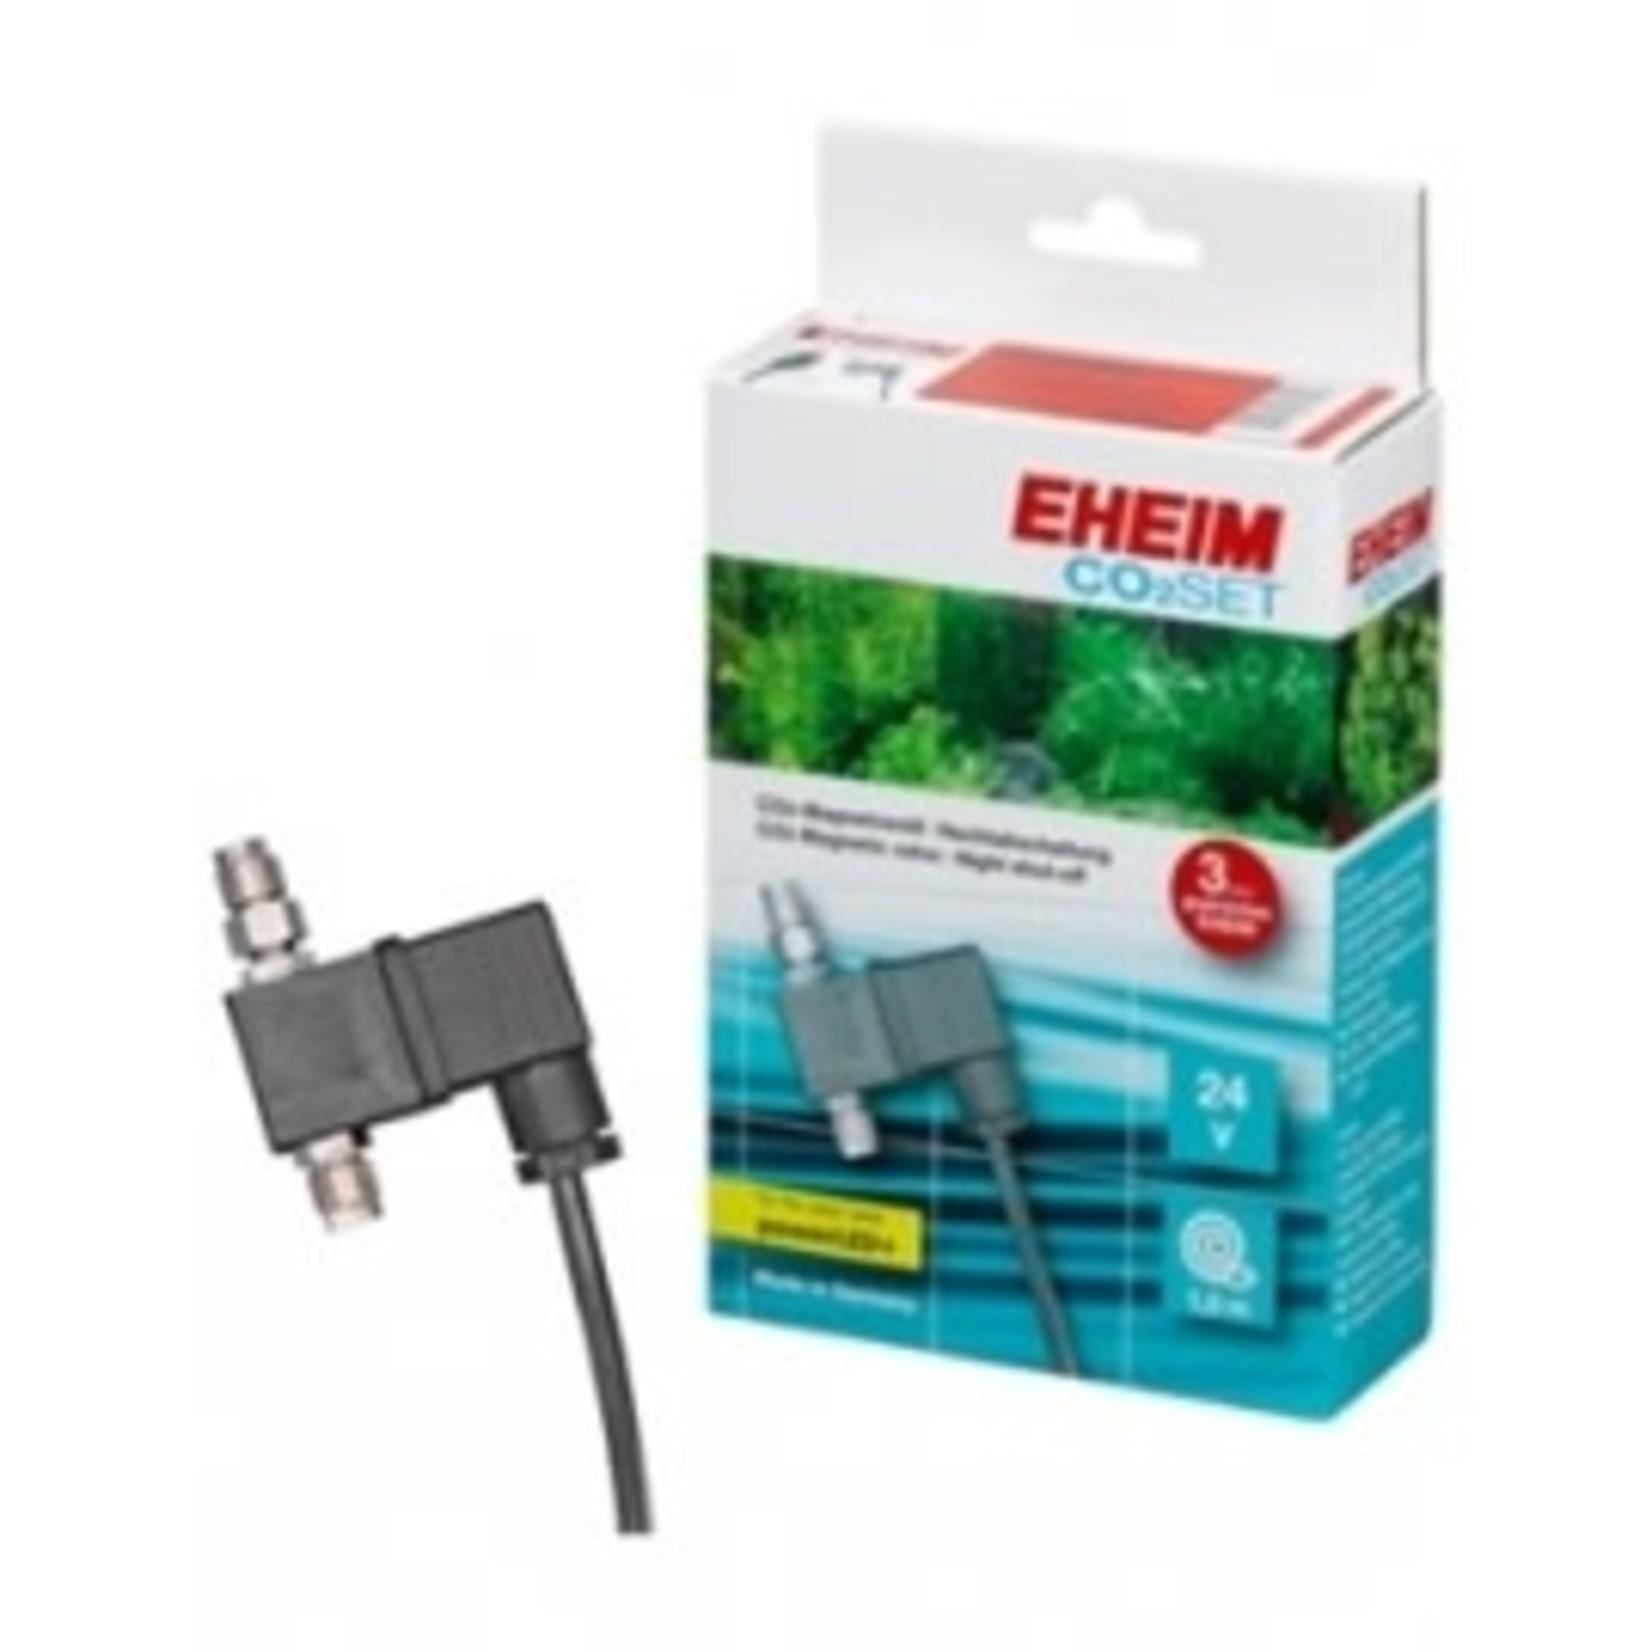 Eheim CO2 MAGNETIC VALVE + connection Power LED EHEIM